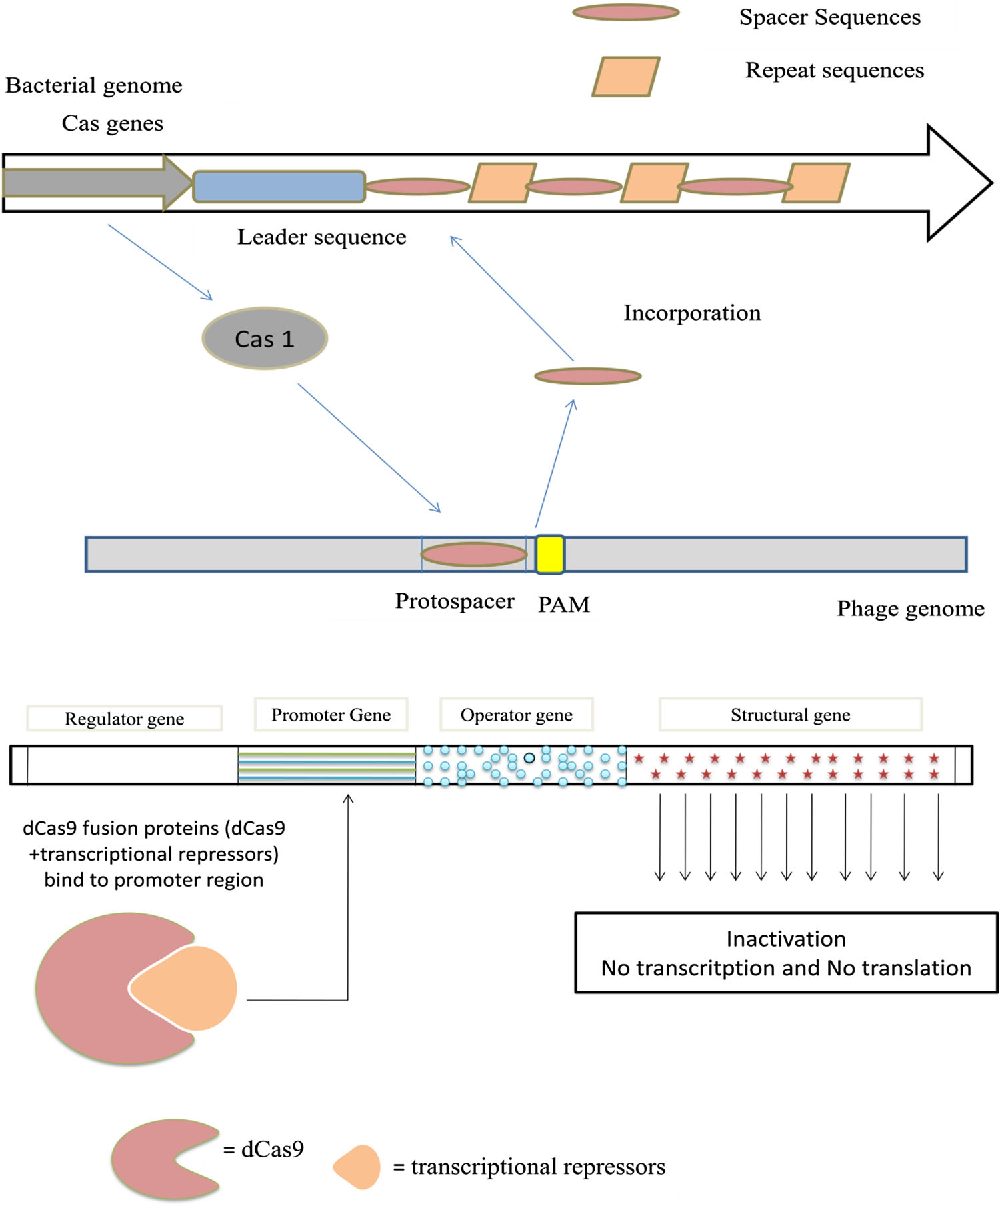 crispr-cas9-mediated genome editing and transcriptional control in yarrowia lipolytica